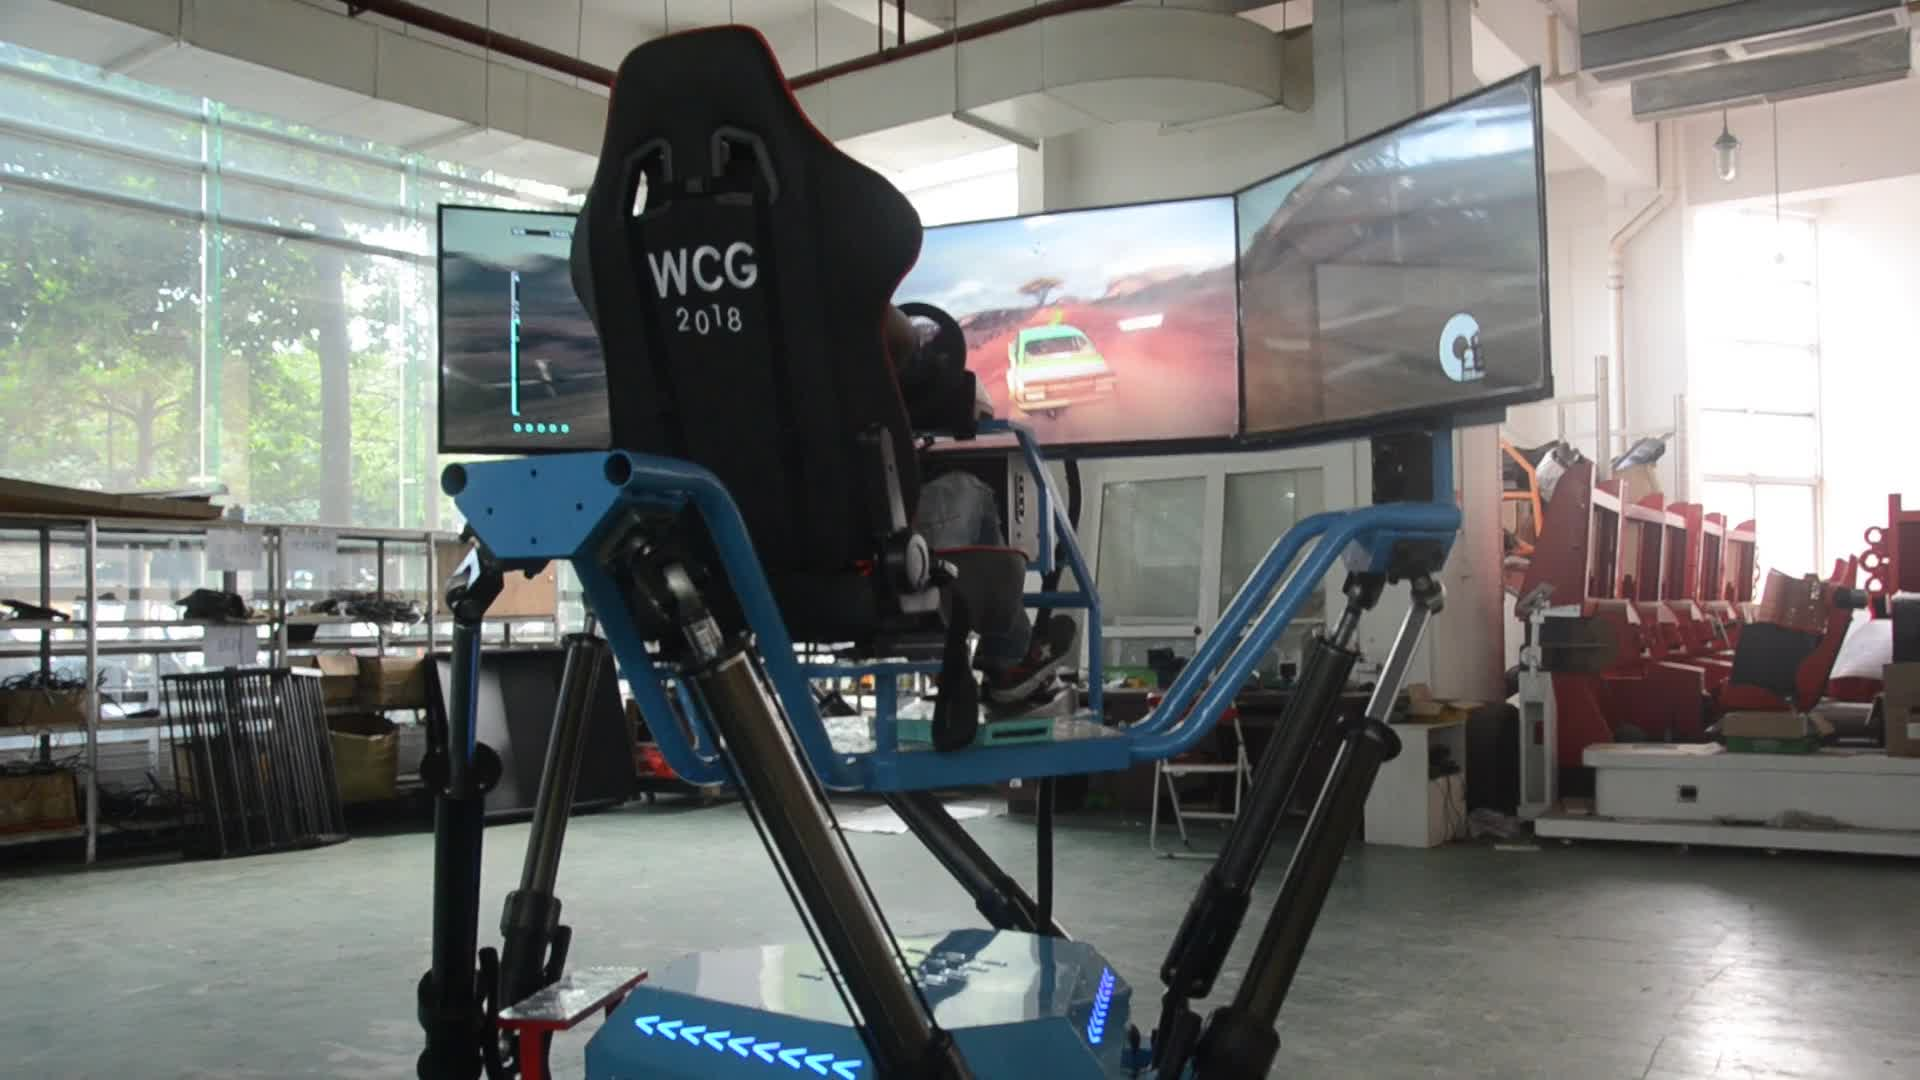 simulator Six-axis-Dynamic-Car arcade vr car racing video game machine car games car racing games